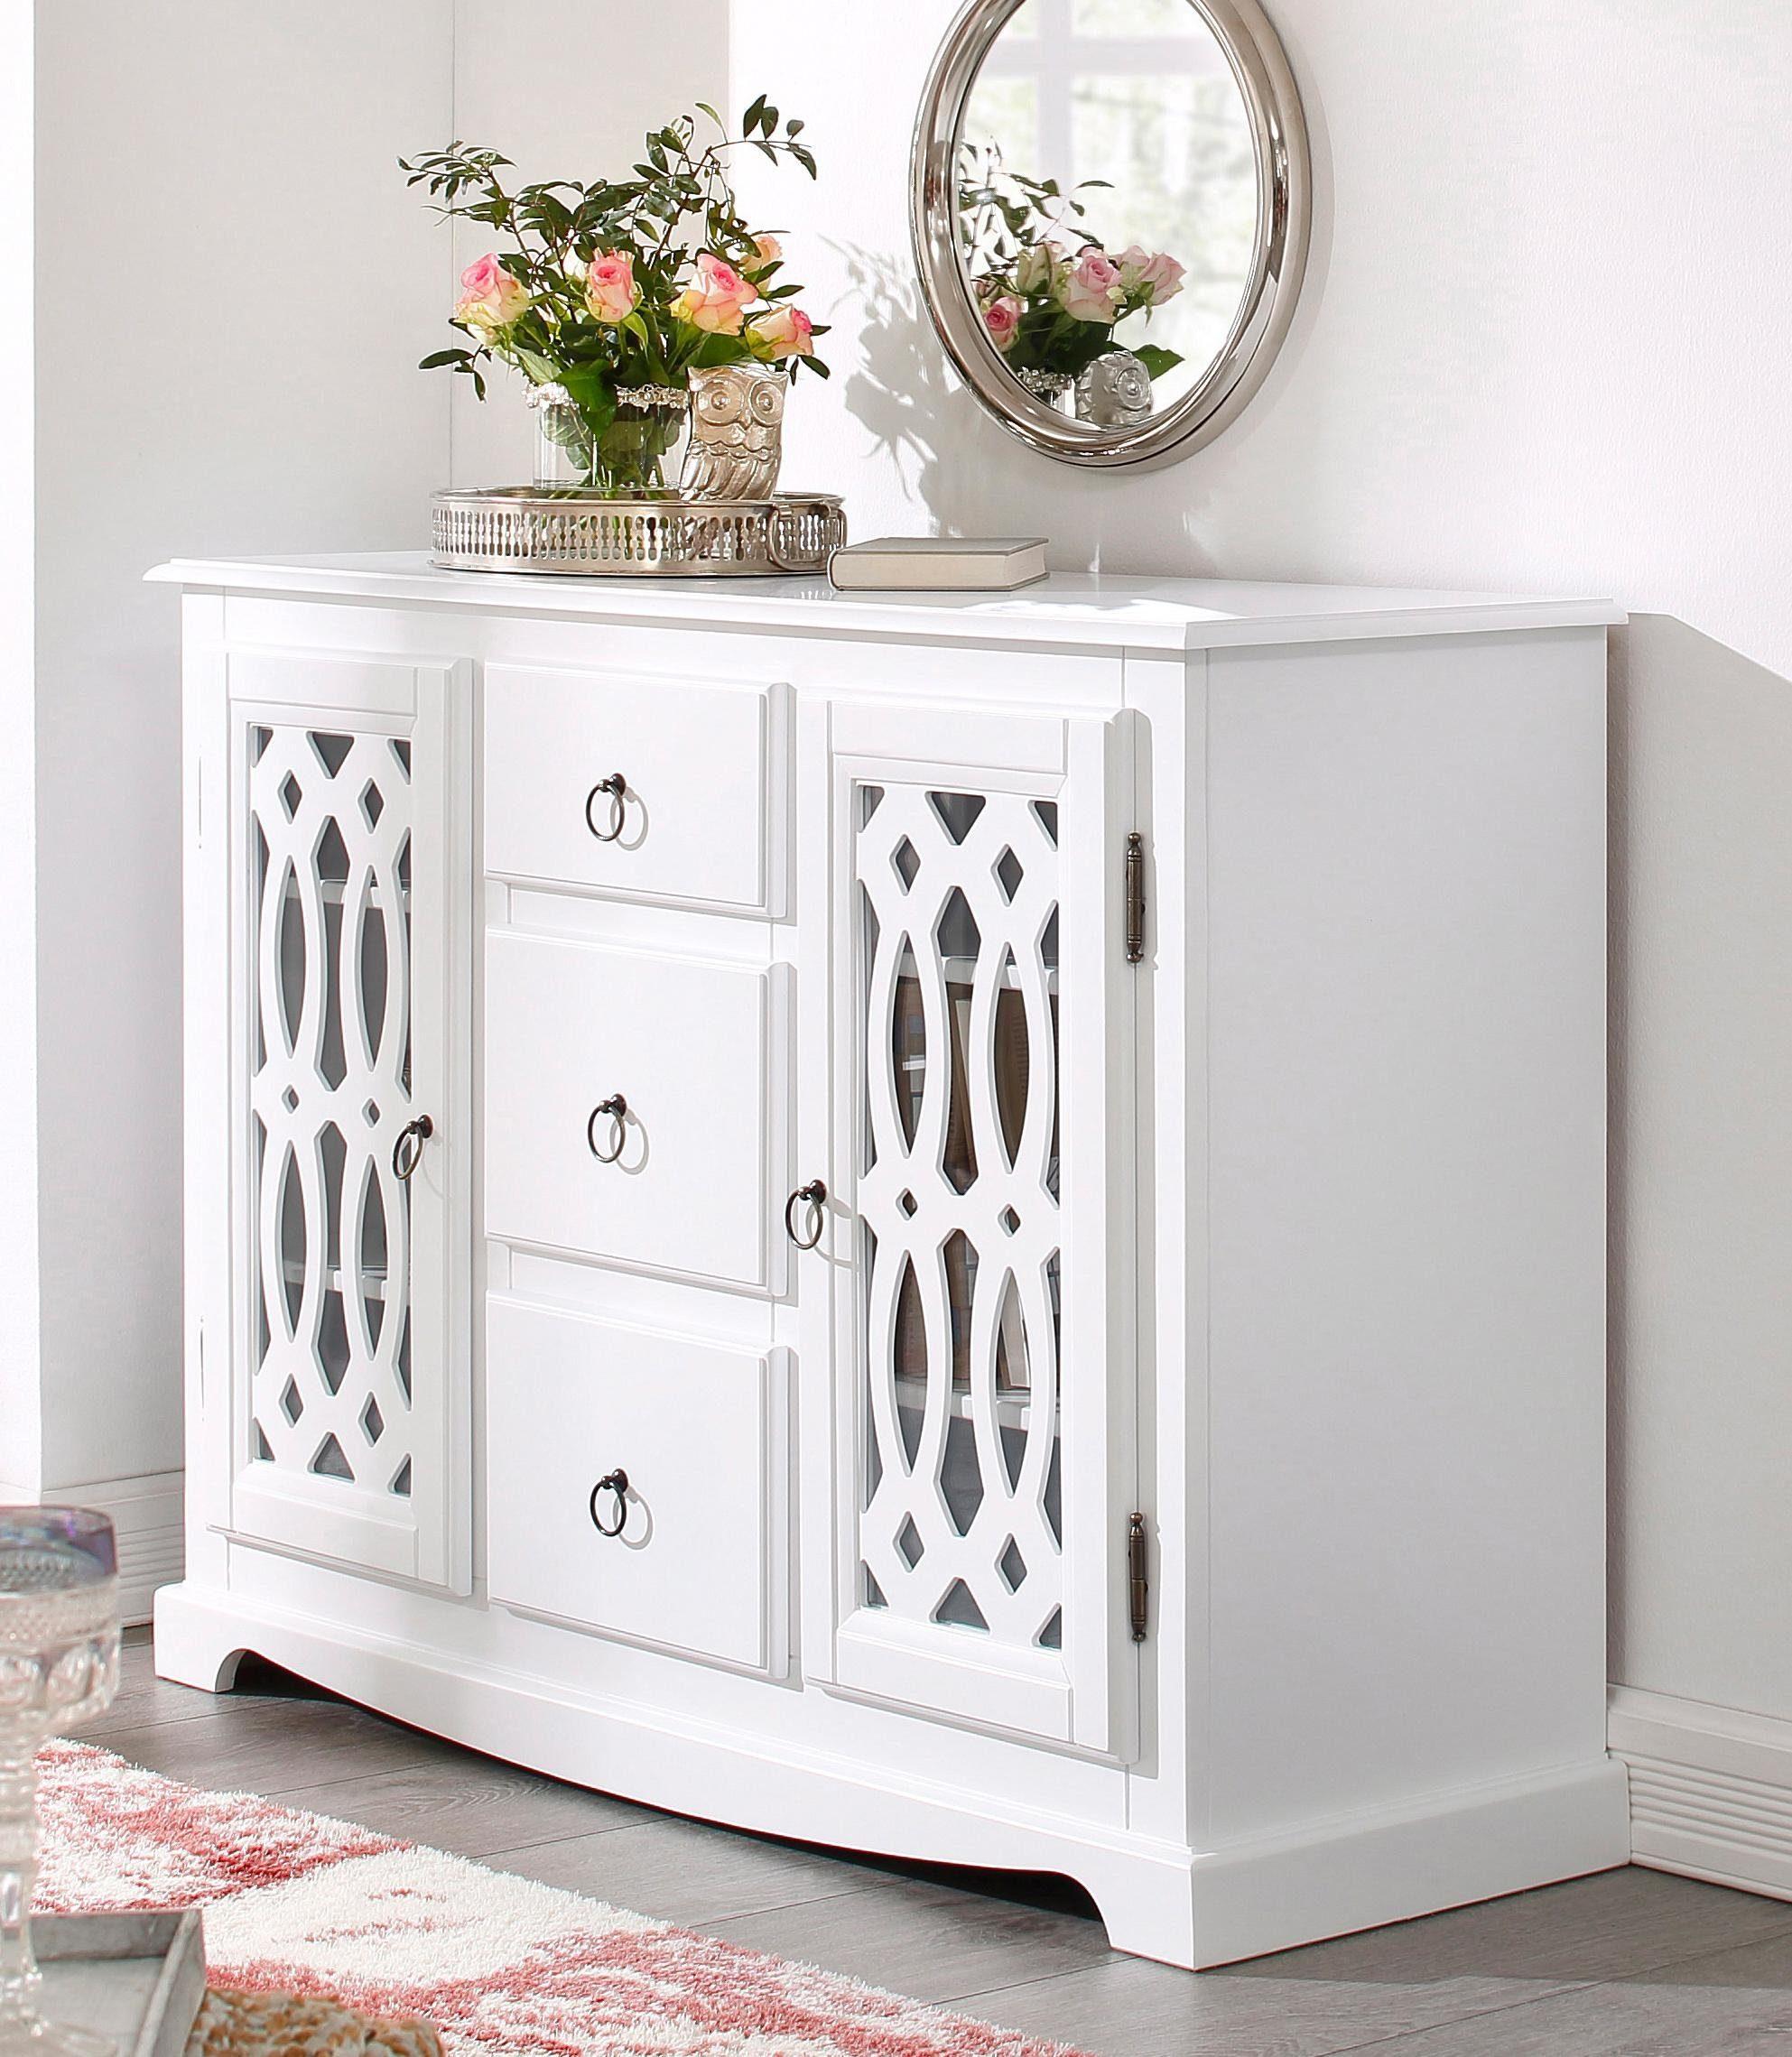 Home affaire Sideboard »Elegance«, Breite 118 cm